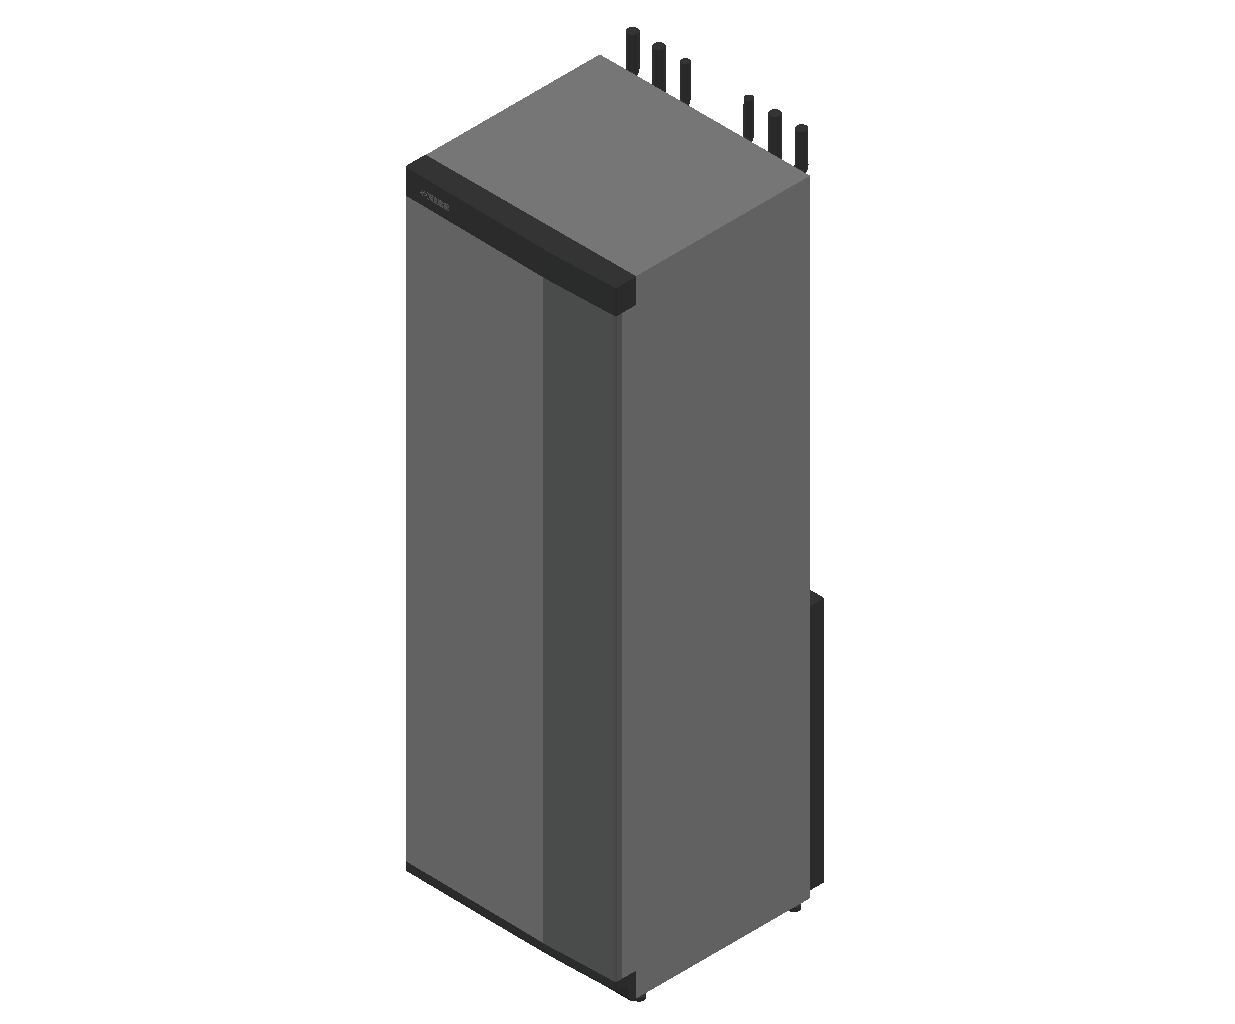 HC_Heat Pump_MEPcontent_NIBE_S1255-12 3x400V_INT-EN.dwg